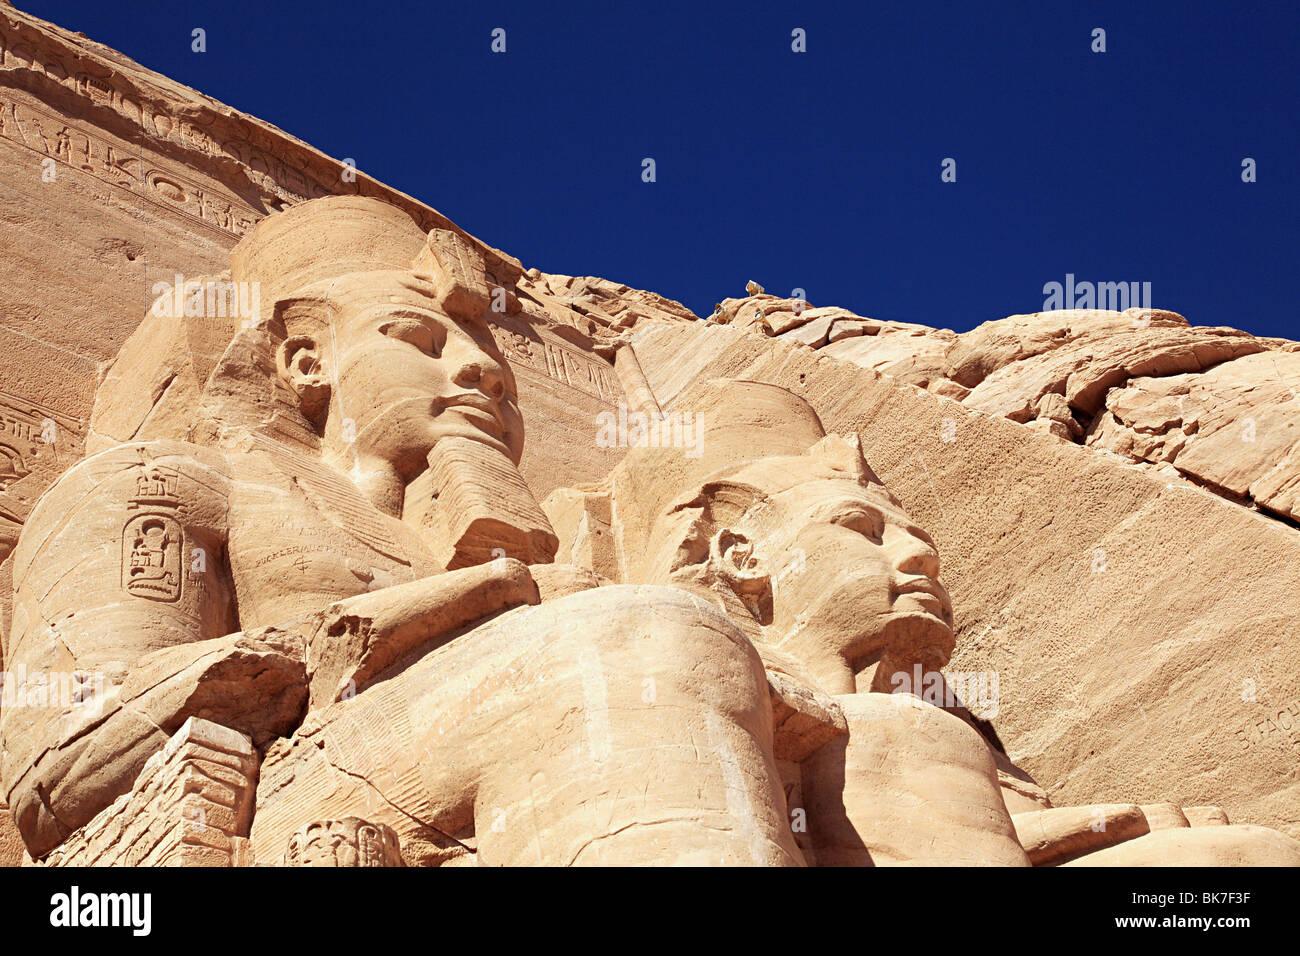 Abu Simbel tempio egitto Immagini Stock